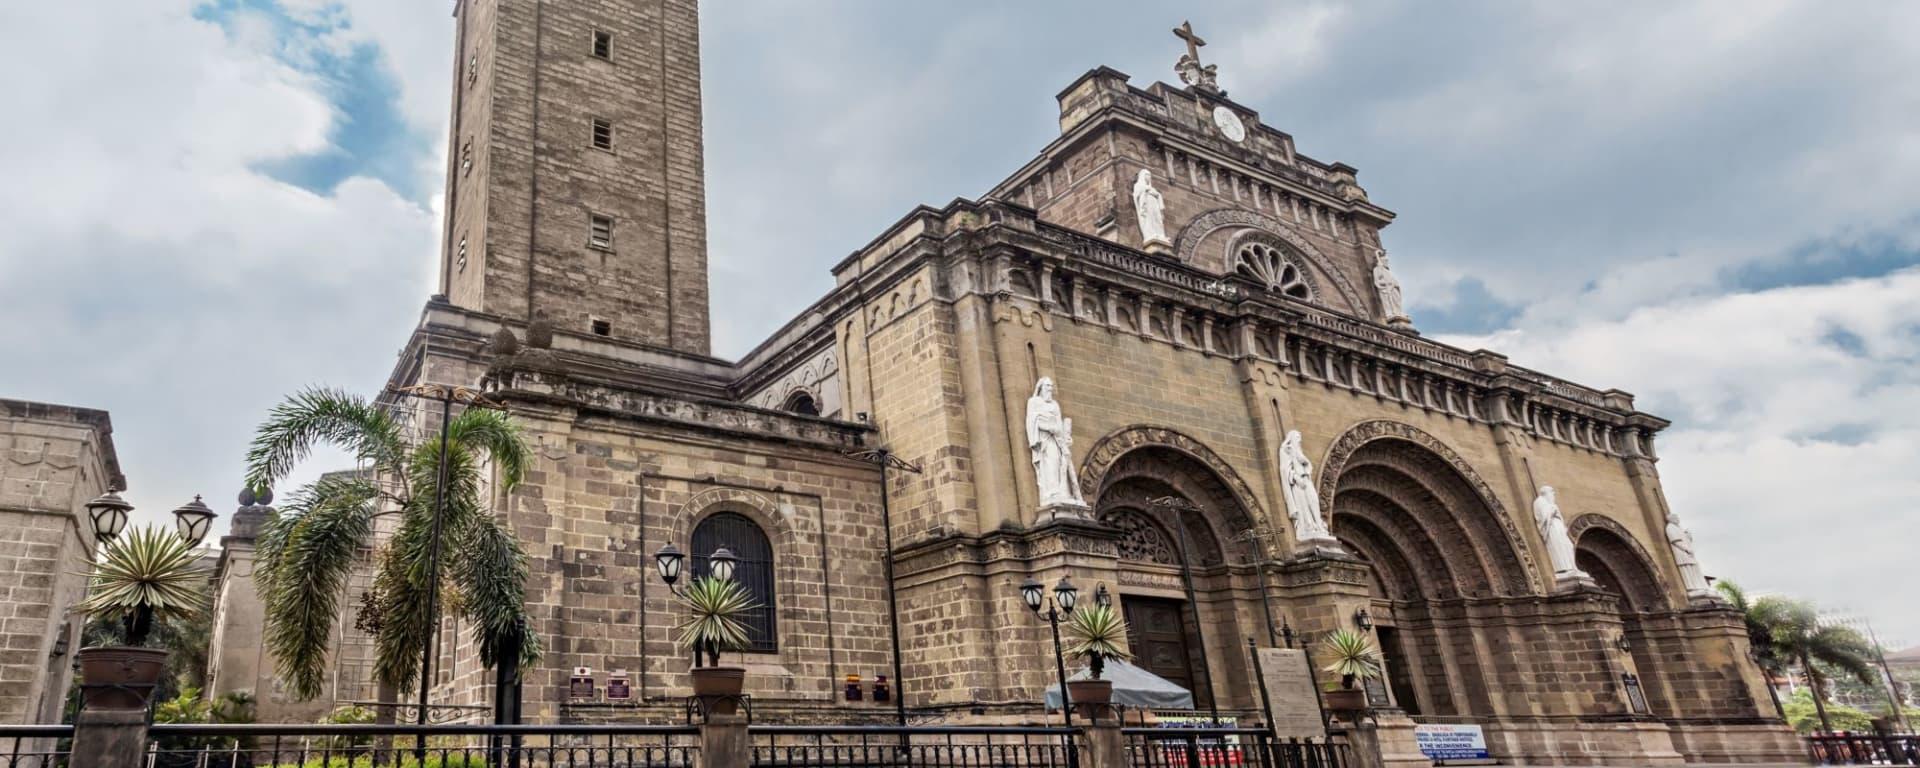 Le vieux Manille sur un vélo de bambou: Manila Cathedral at Intramuros